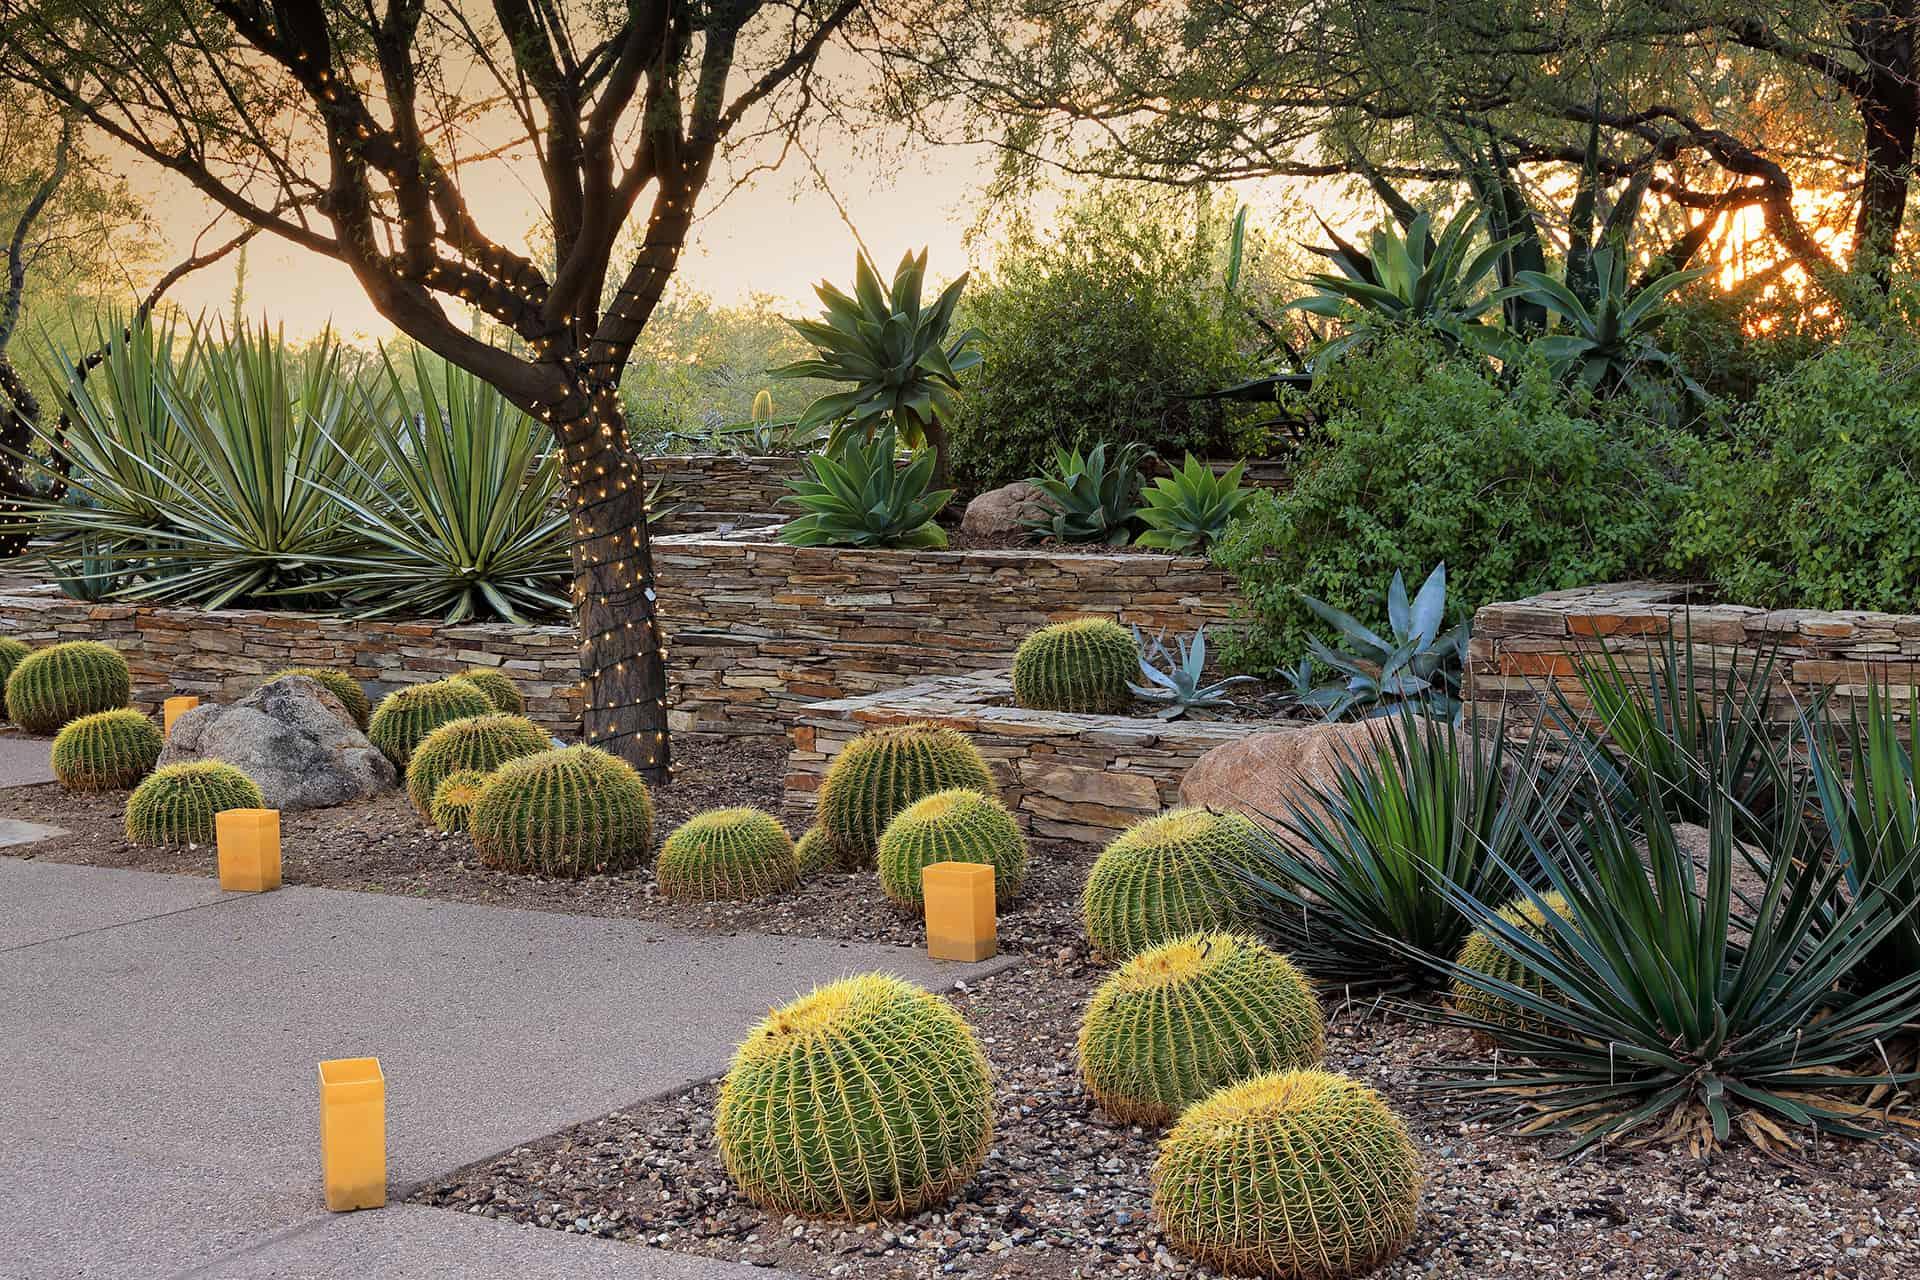 15 Amazing Desert Landscaping Ideas | Green and Vibrant on Desert Landscape Ideas For Backyards id=60250